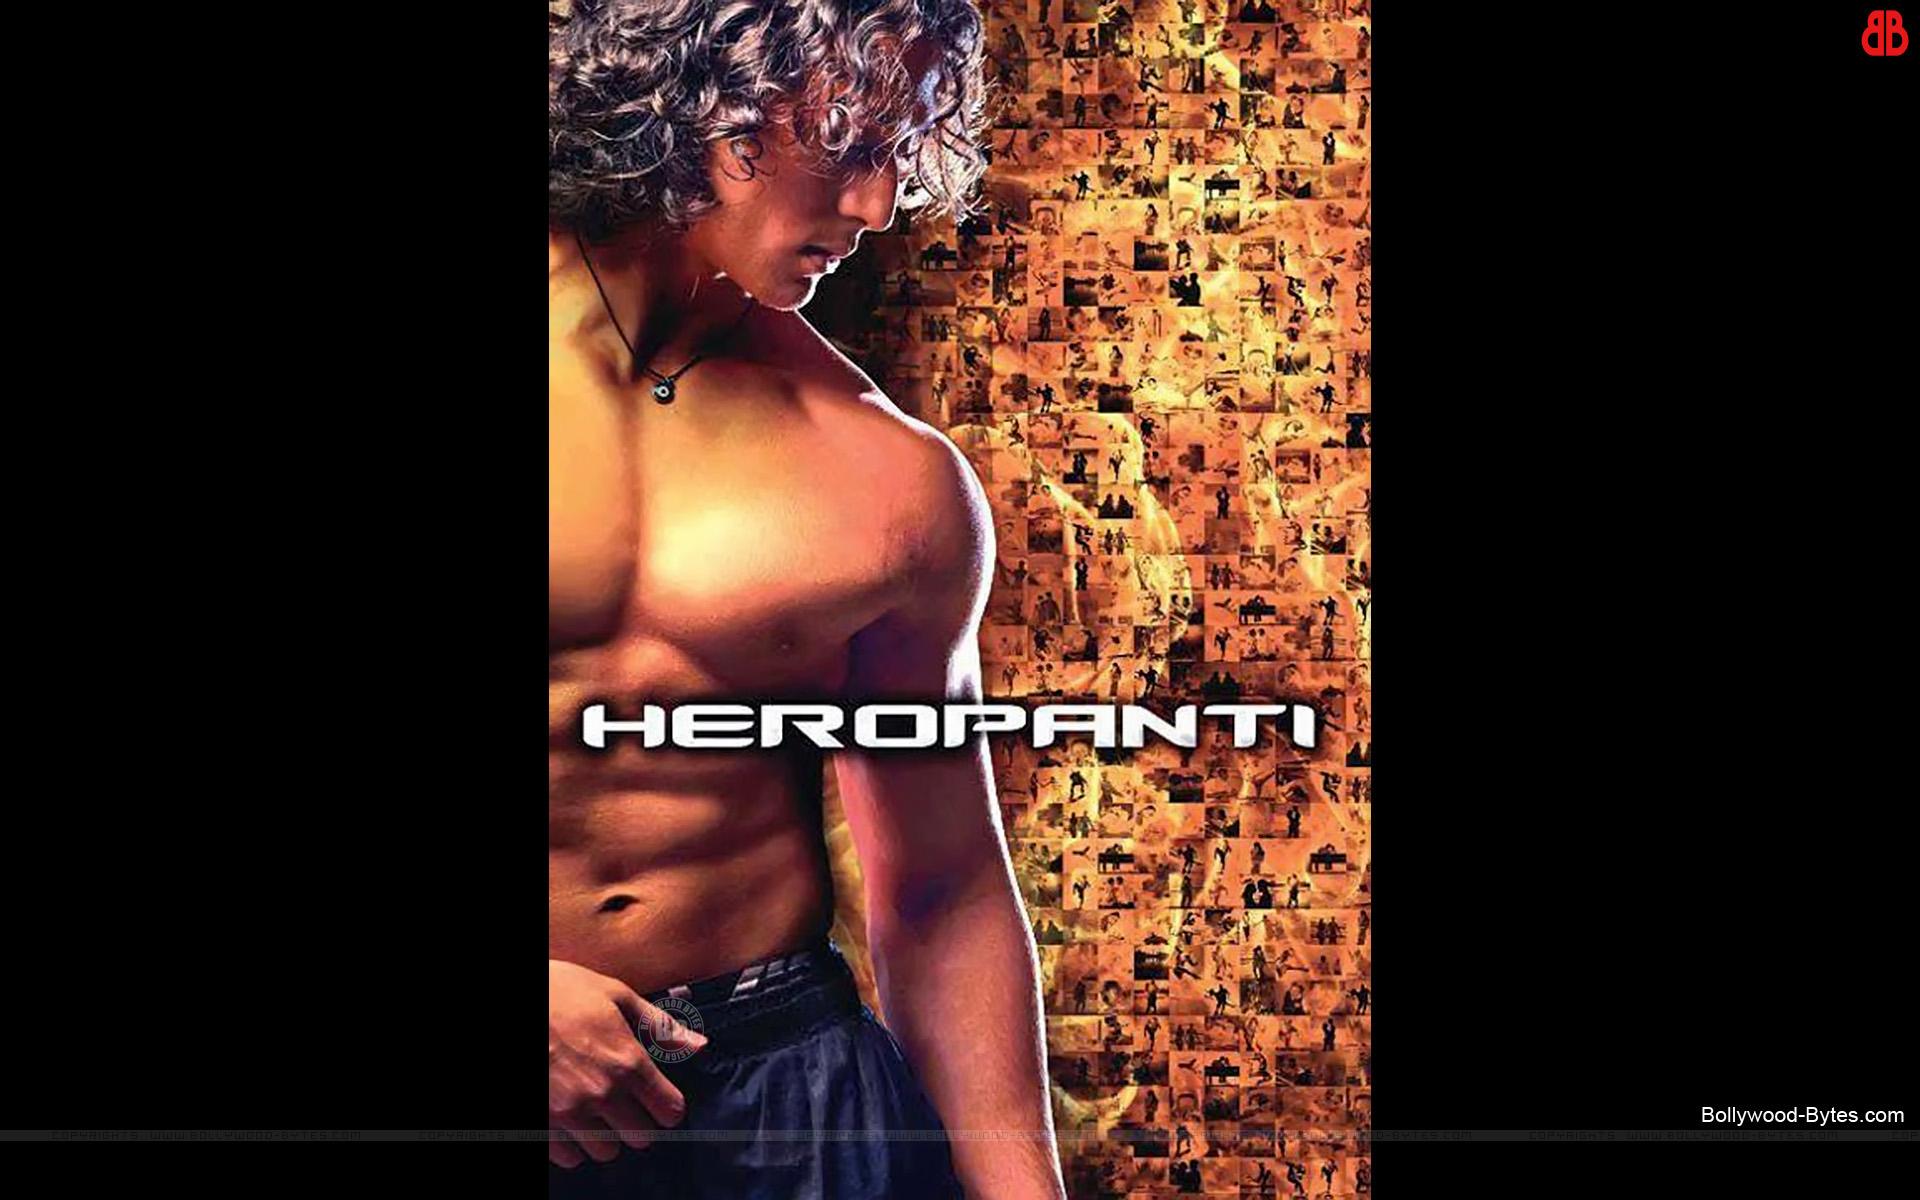 http://3.bp.blogspot.com/-MLePV_Fc4PA/UUYEQP6H_II/AAAAAAAAcqY/fqgbqIjr_oY/s1920/Heropanti+-super-Tiger-Shroff-Shirtless-HD-Wallpaper-01.jpg